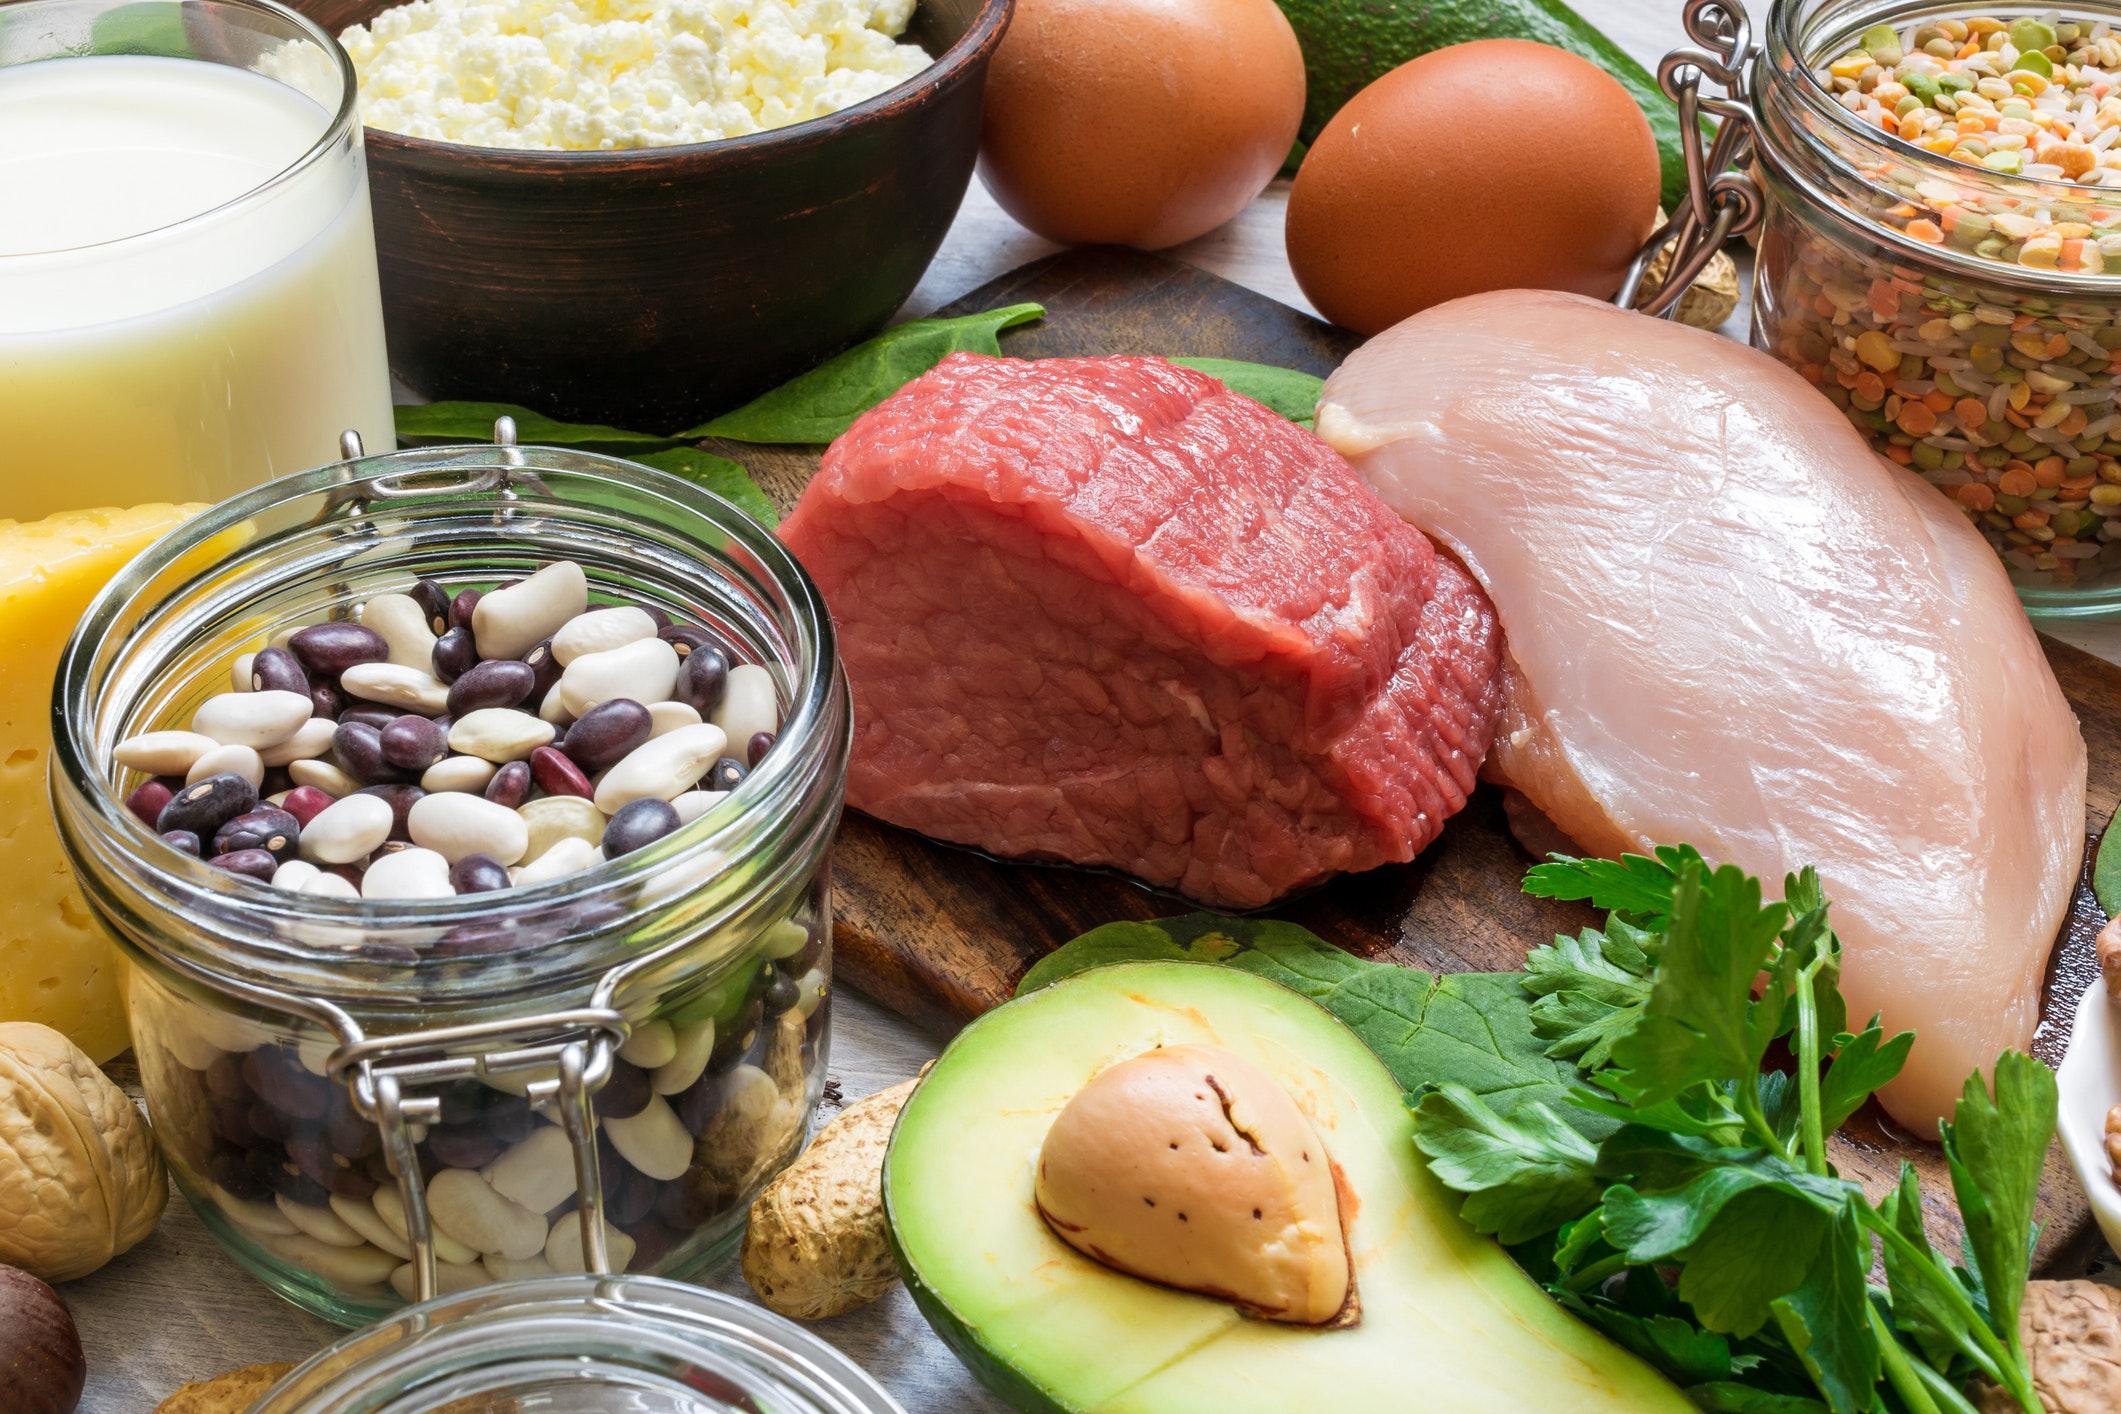 hvordan får man b vitamin